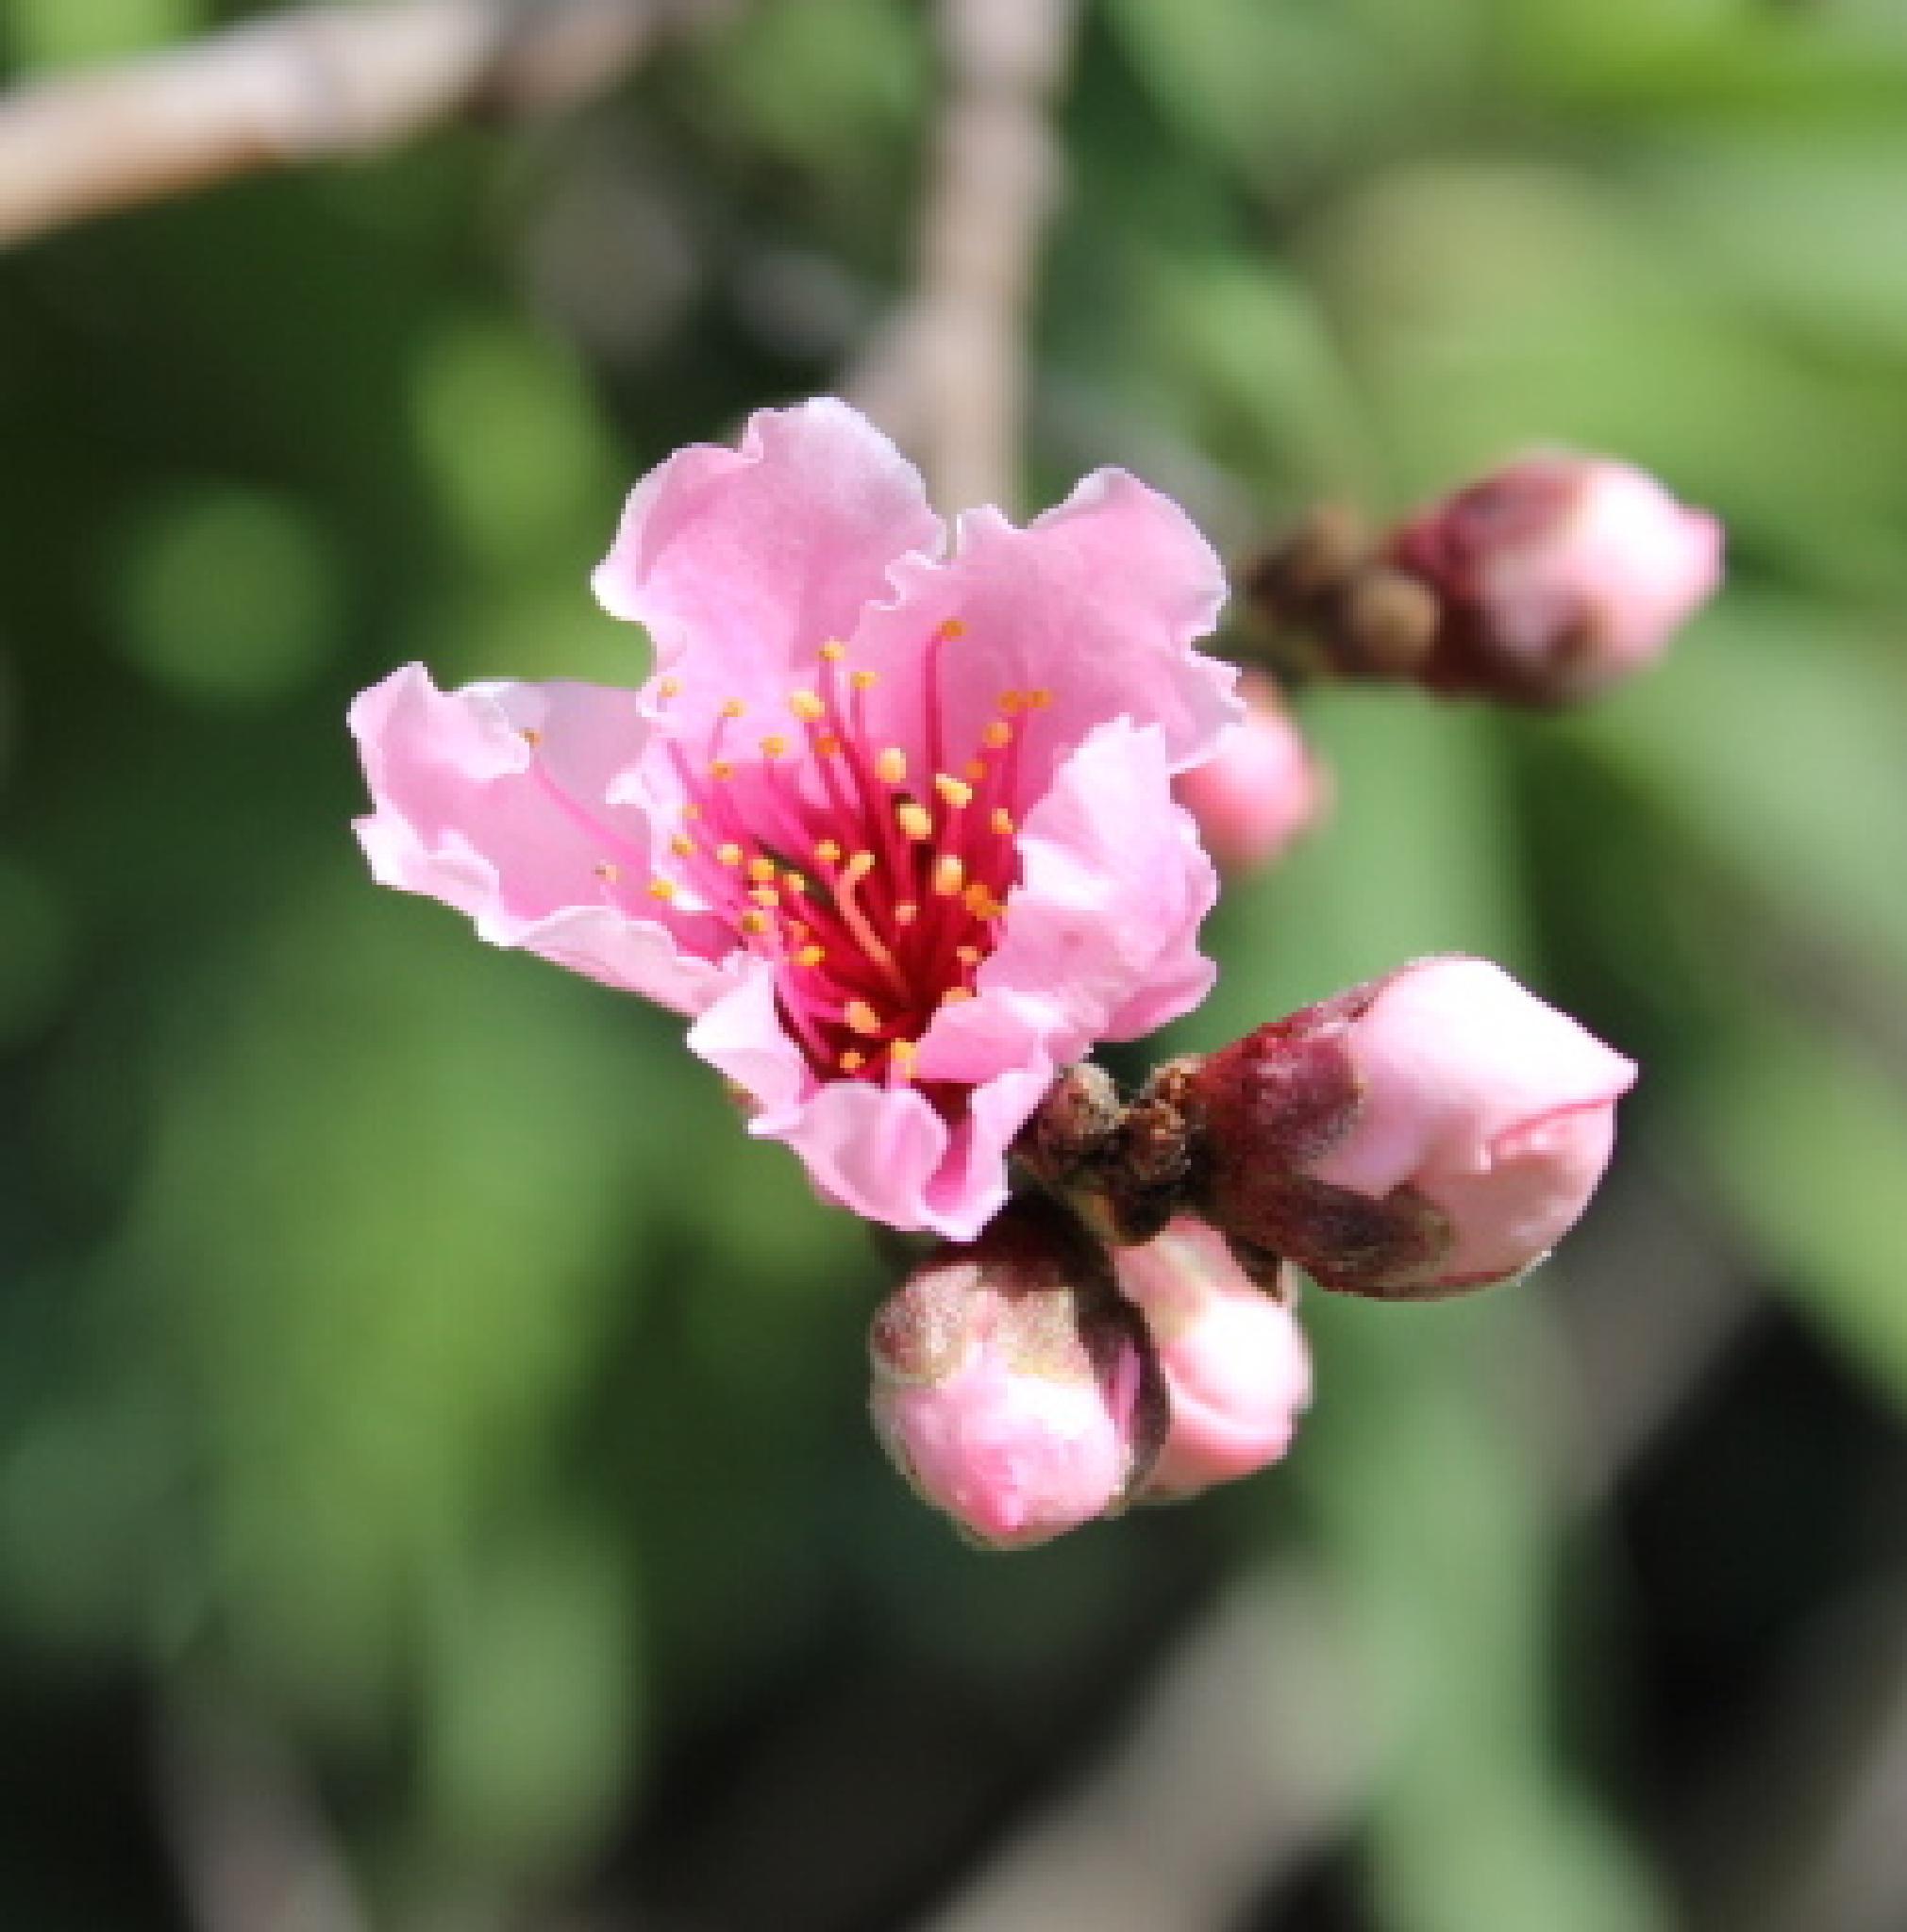 Nectarine in Flower by Enchanted Seashells by Princess Rosebud